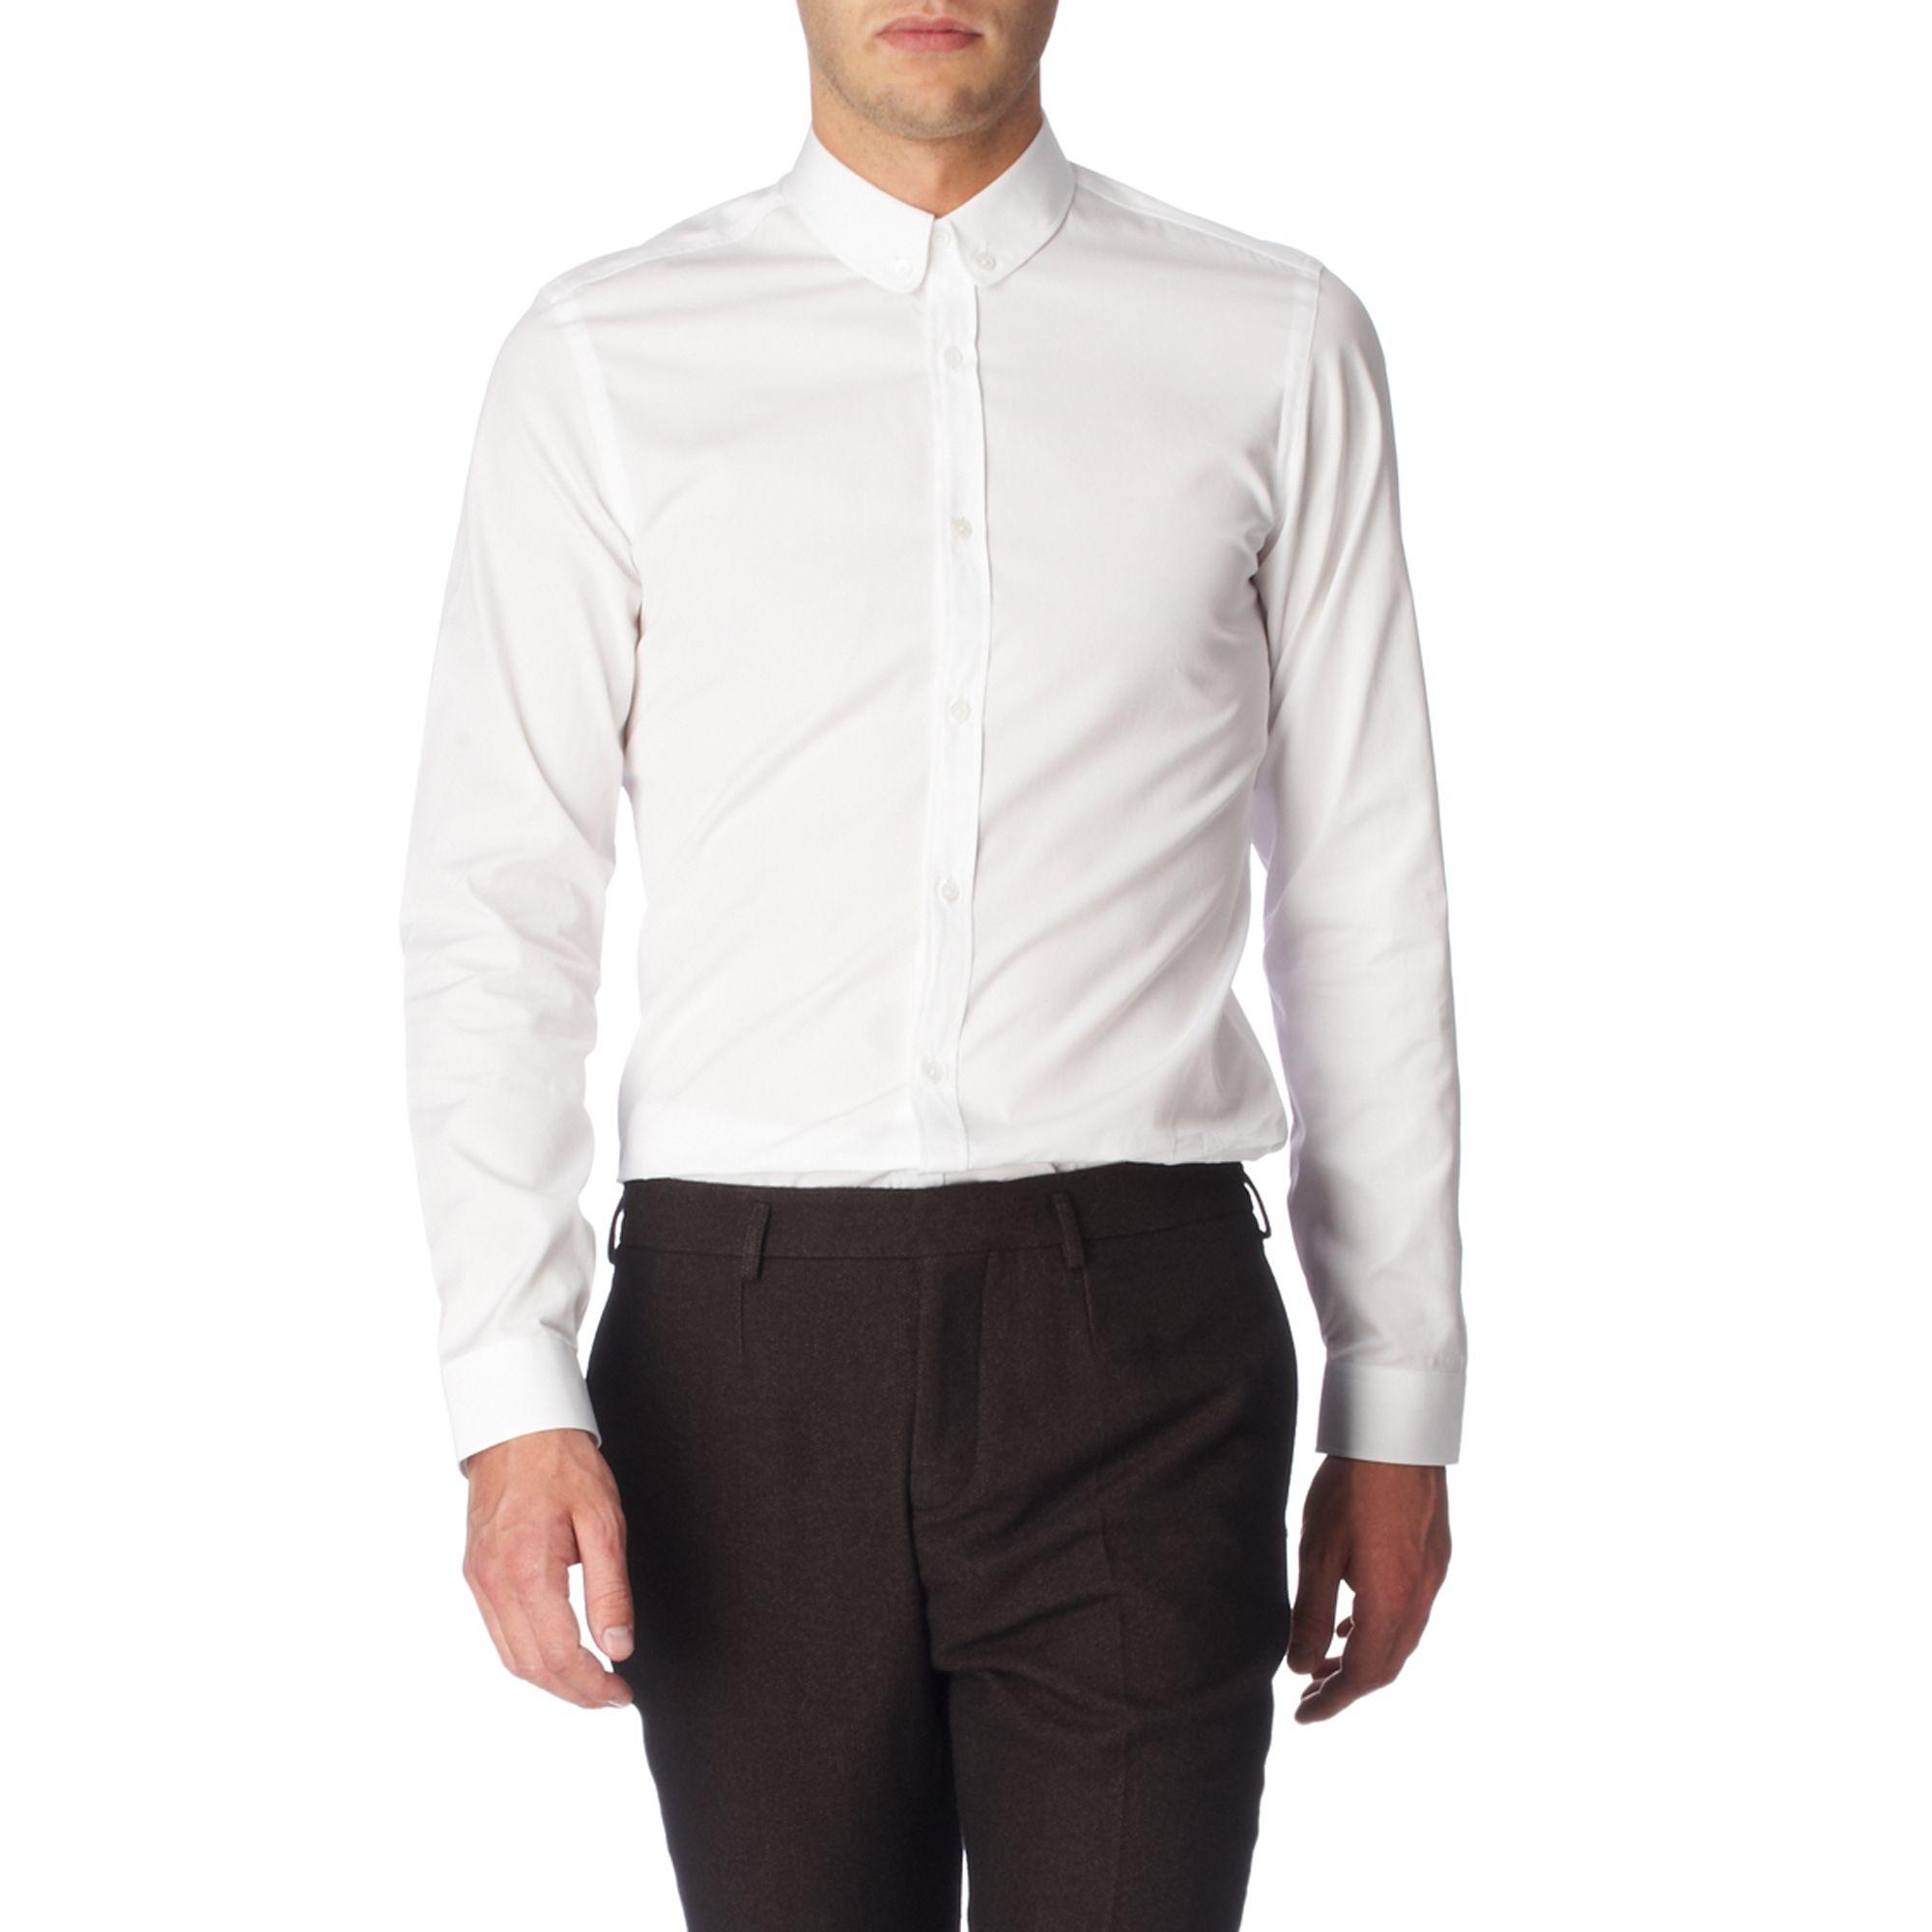 burberry prorsum plain slim fit single cuff shirt white in